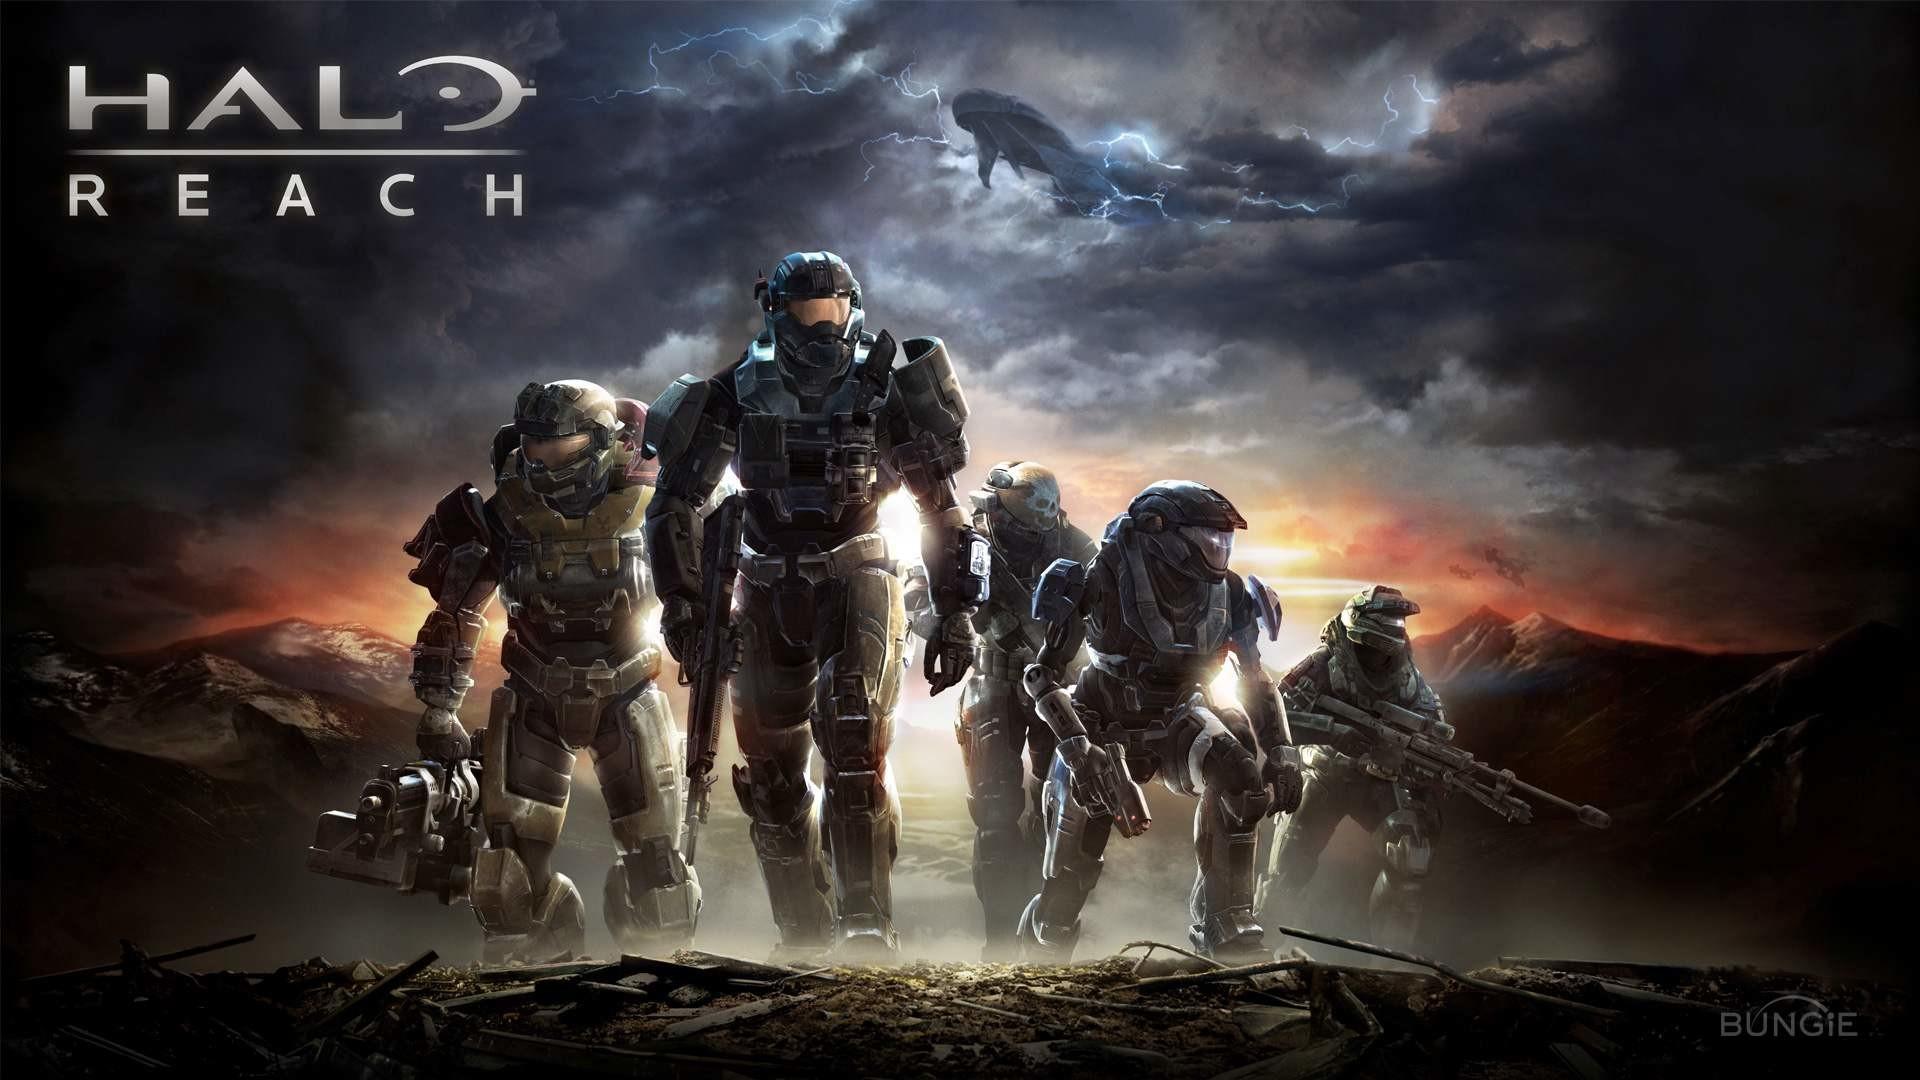 Halo Reach 1080p Wallpaper Halo Reach 720p Wallpaper